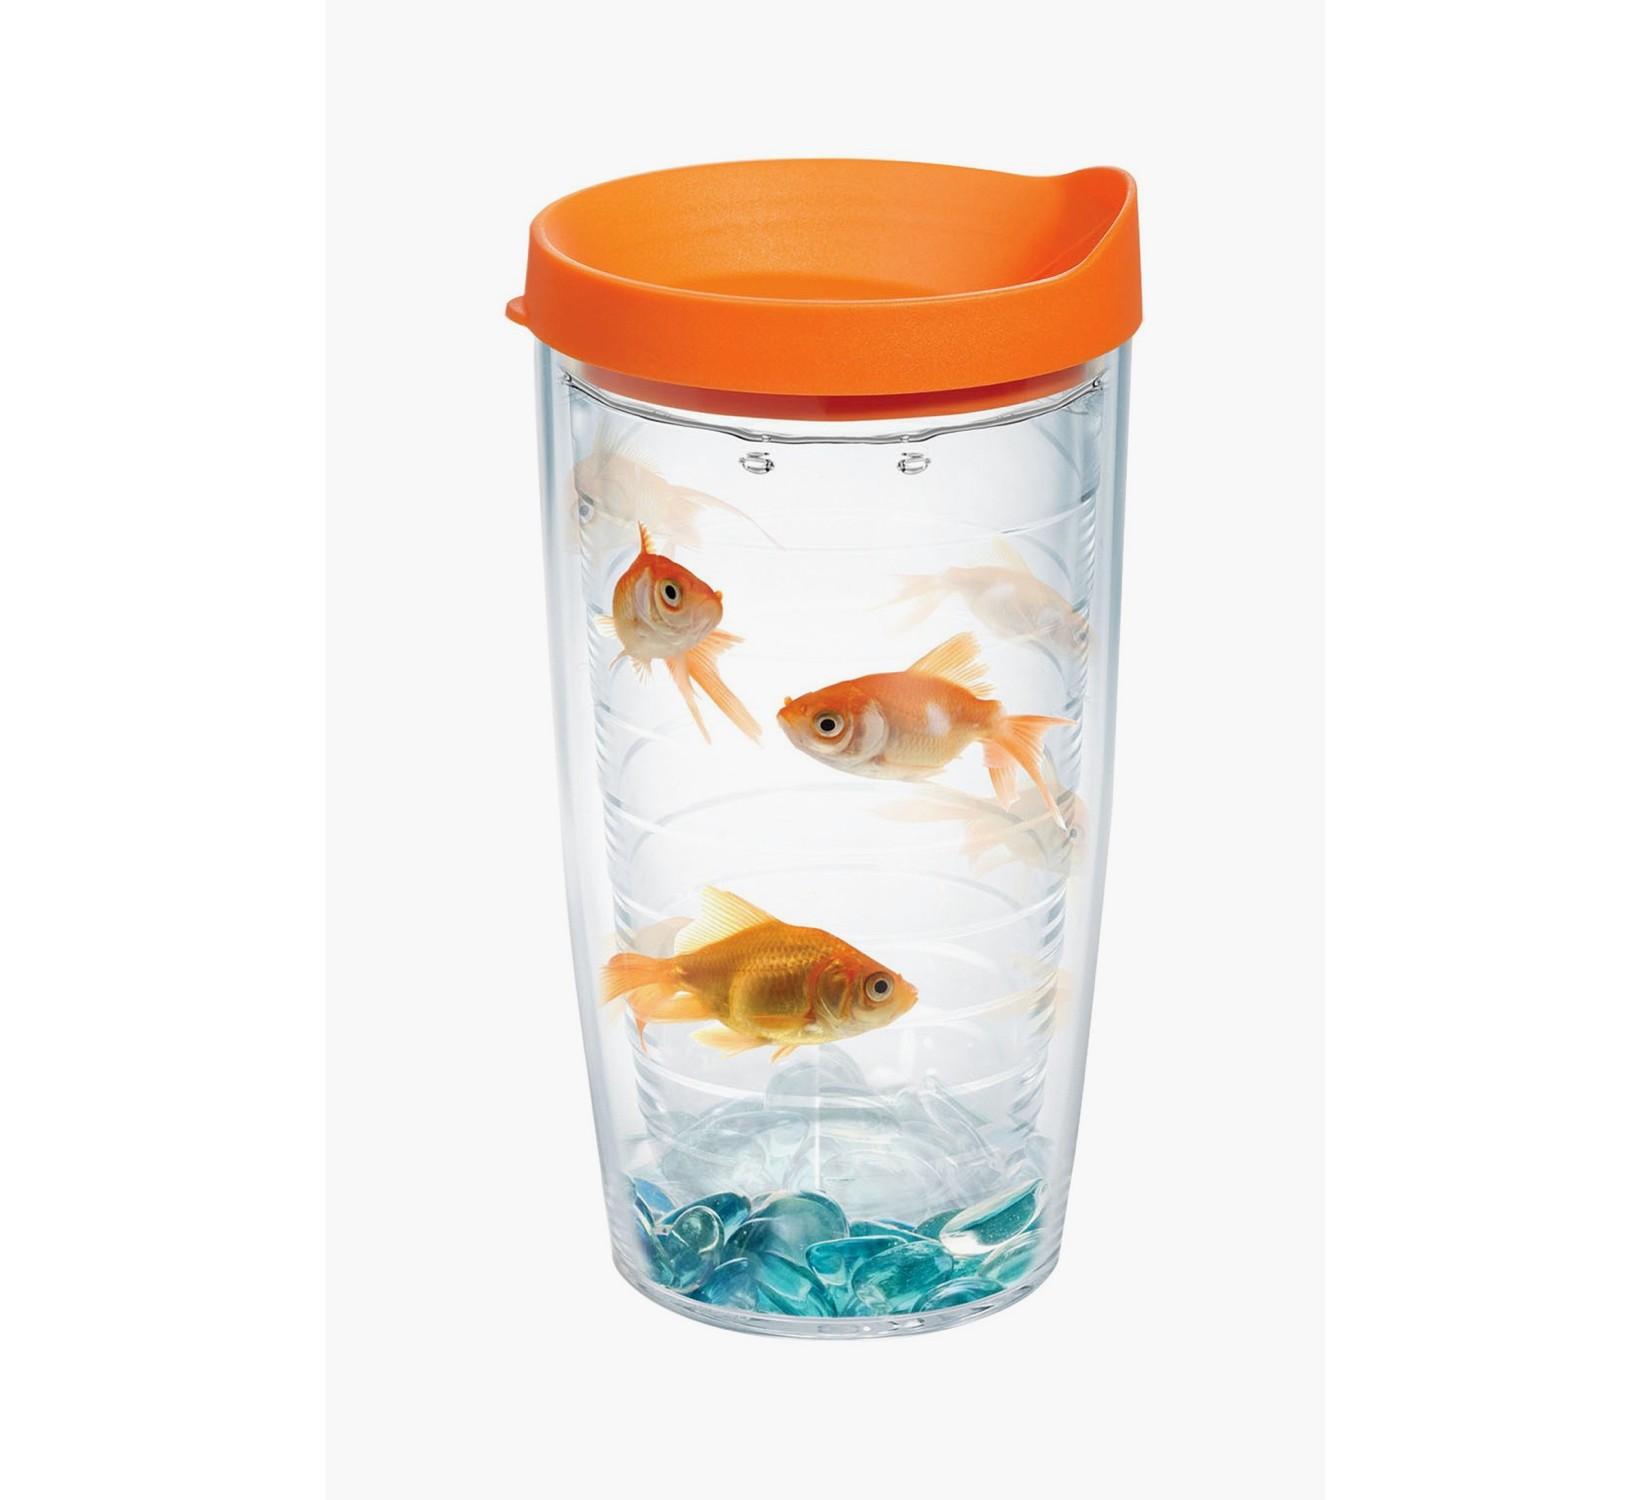 Tervis 16oz Tumbler - Goldfish